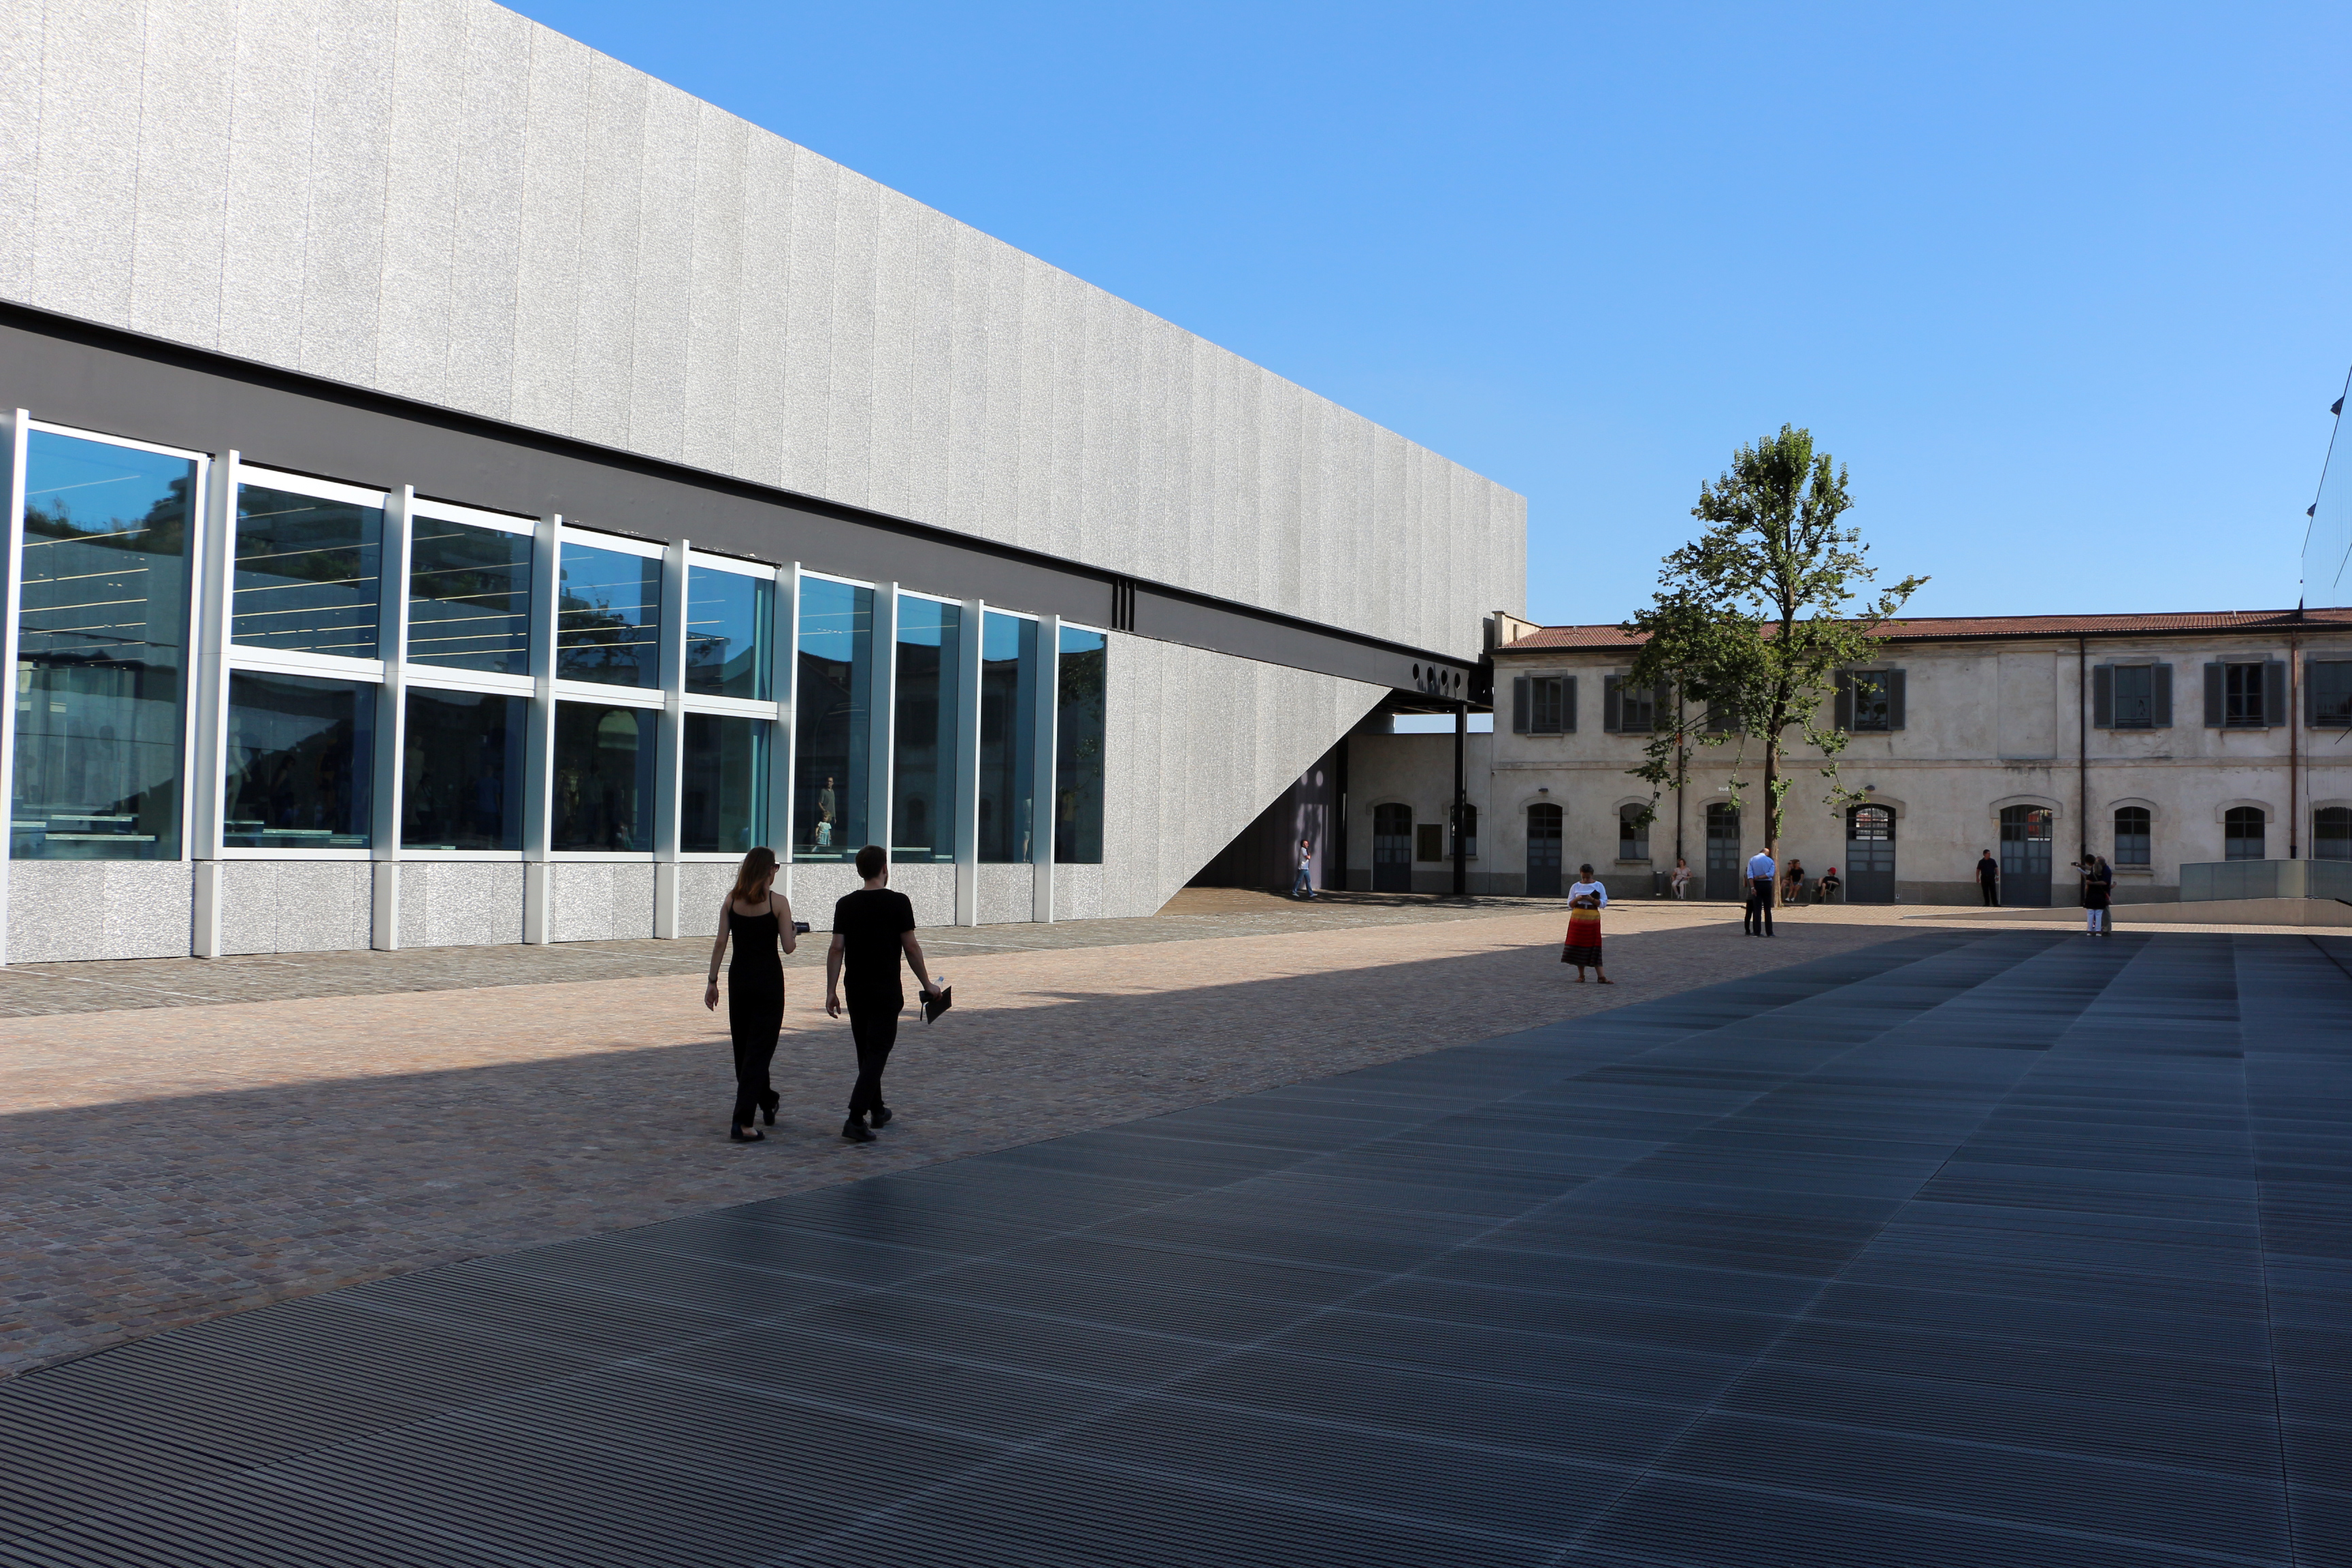 sale retailer 2c86d bdee7 Fondazione Prada - Wikipedia